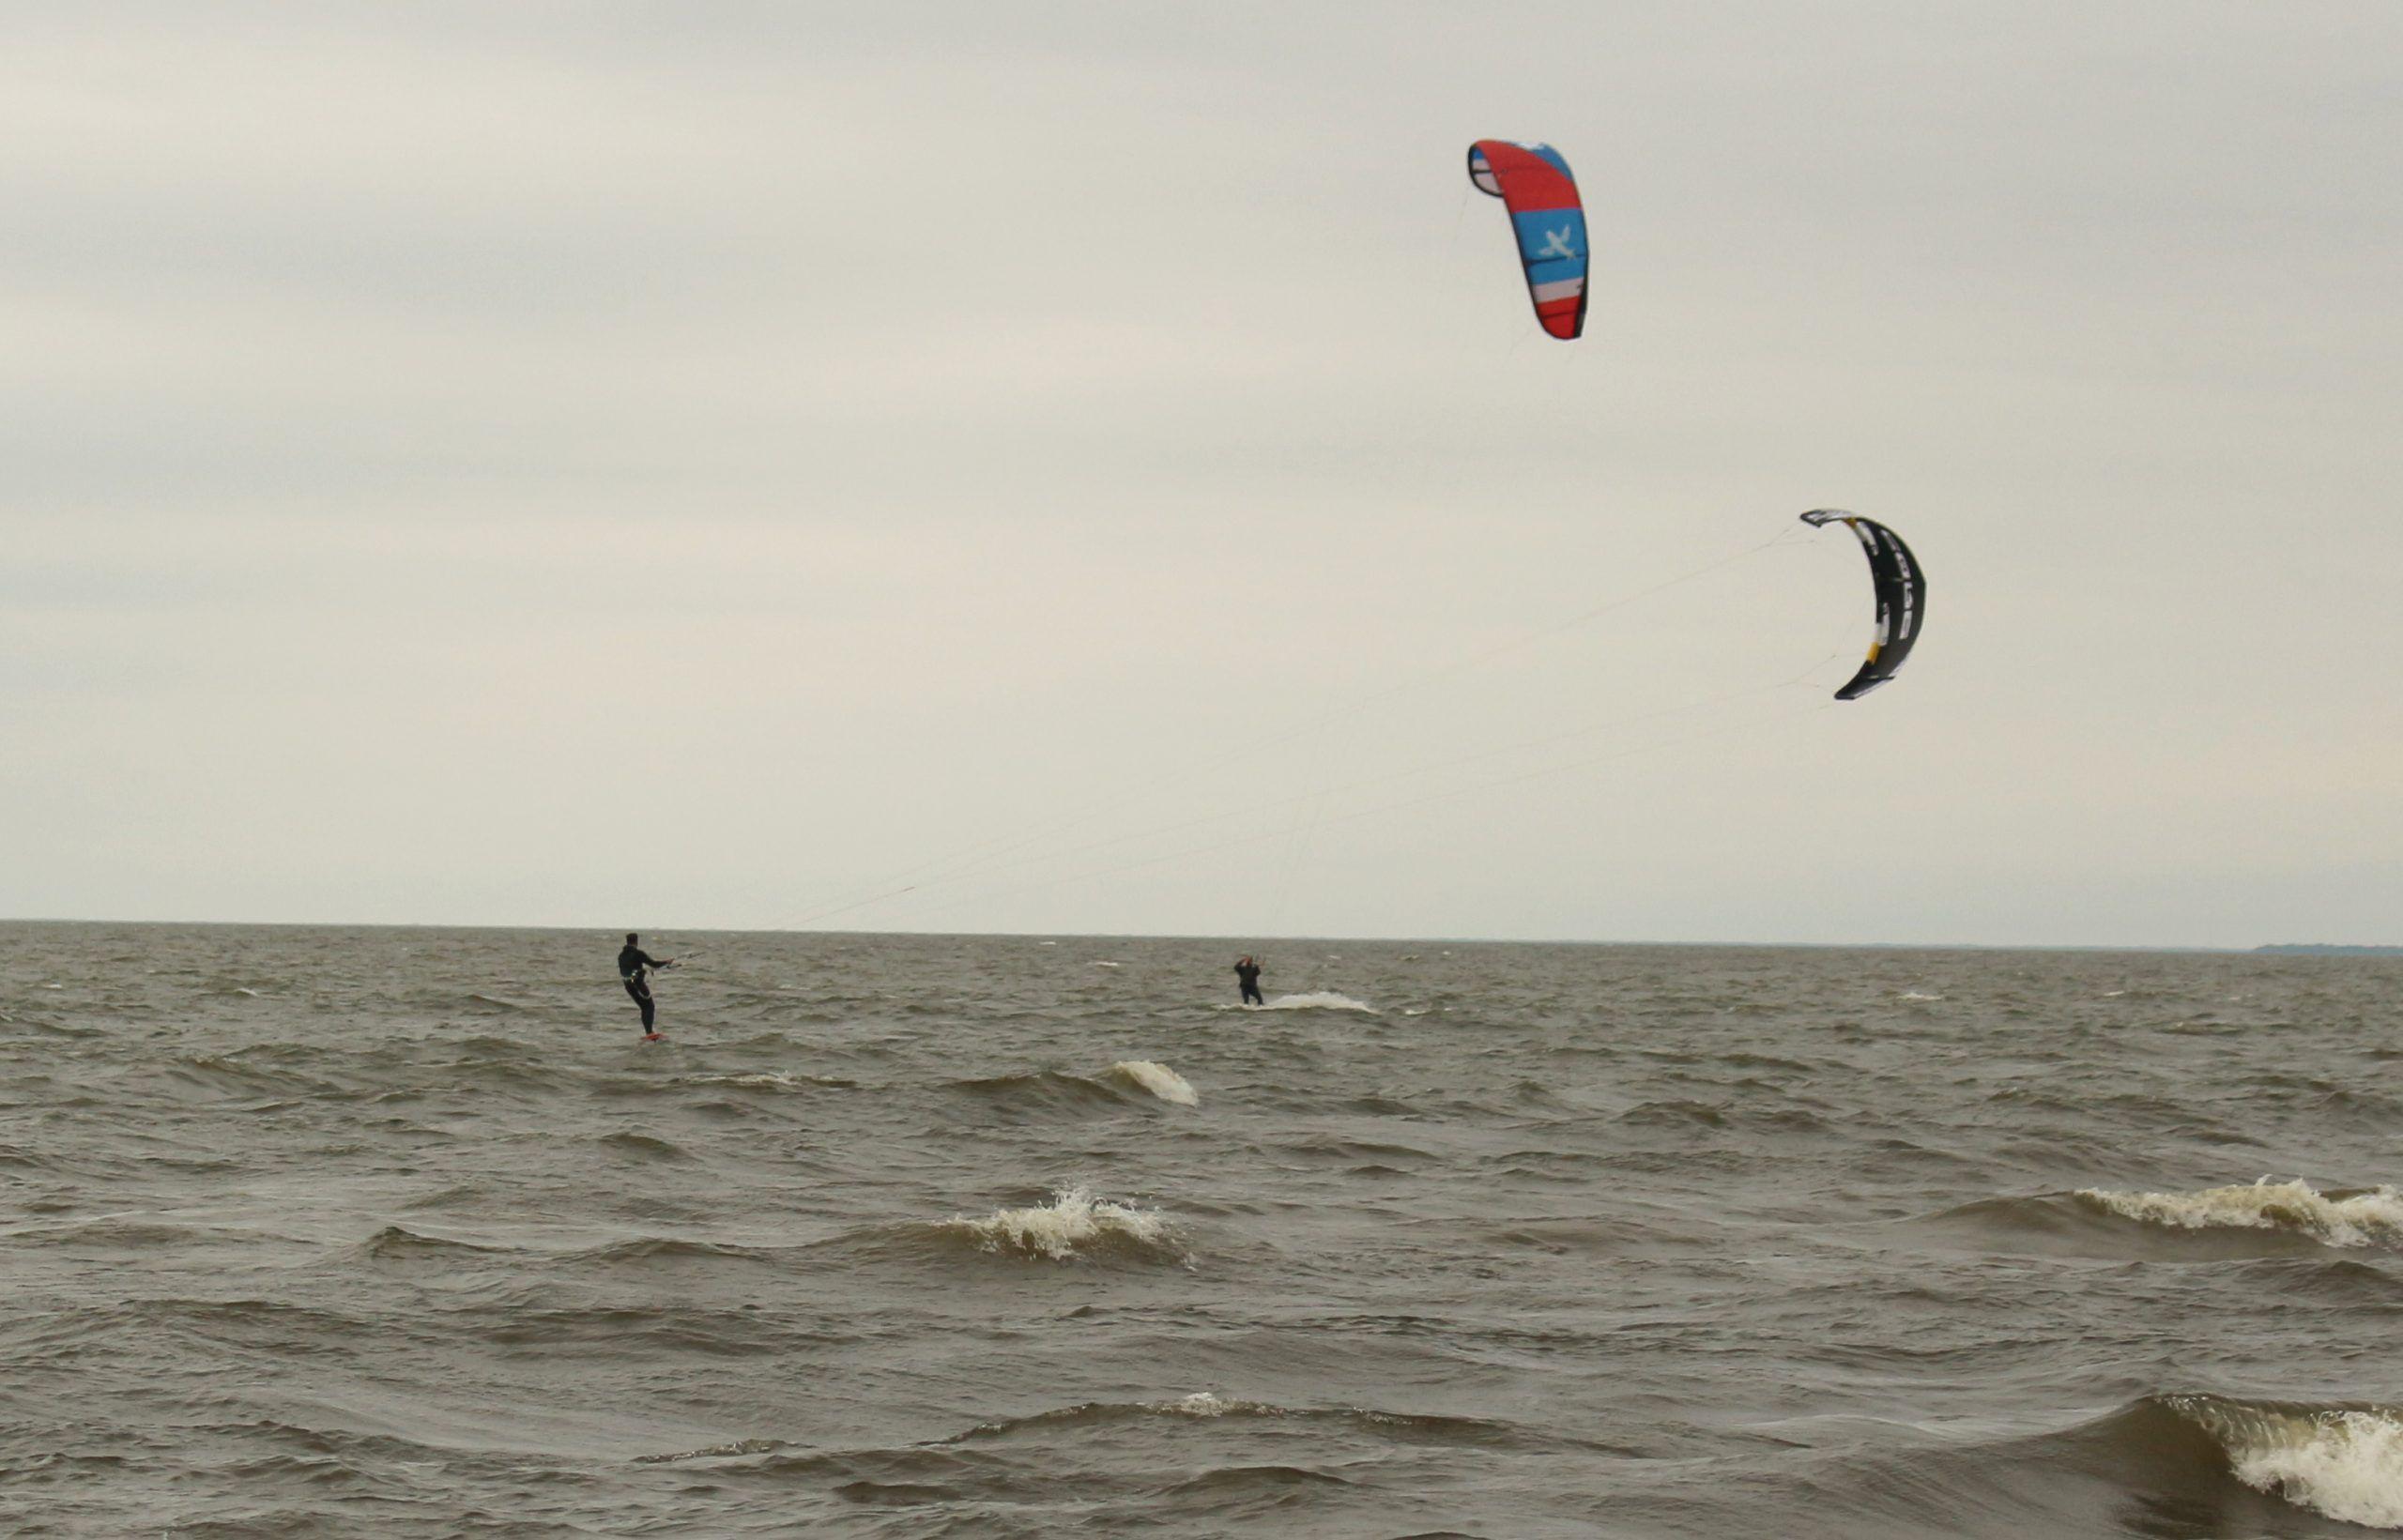 Kite boarders take last kick at the waves – Lakeshore Advance